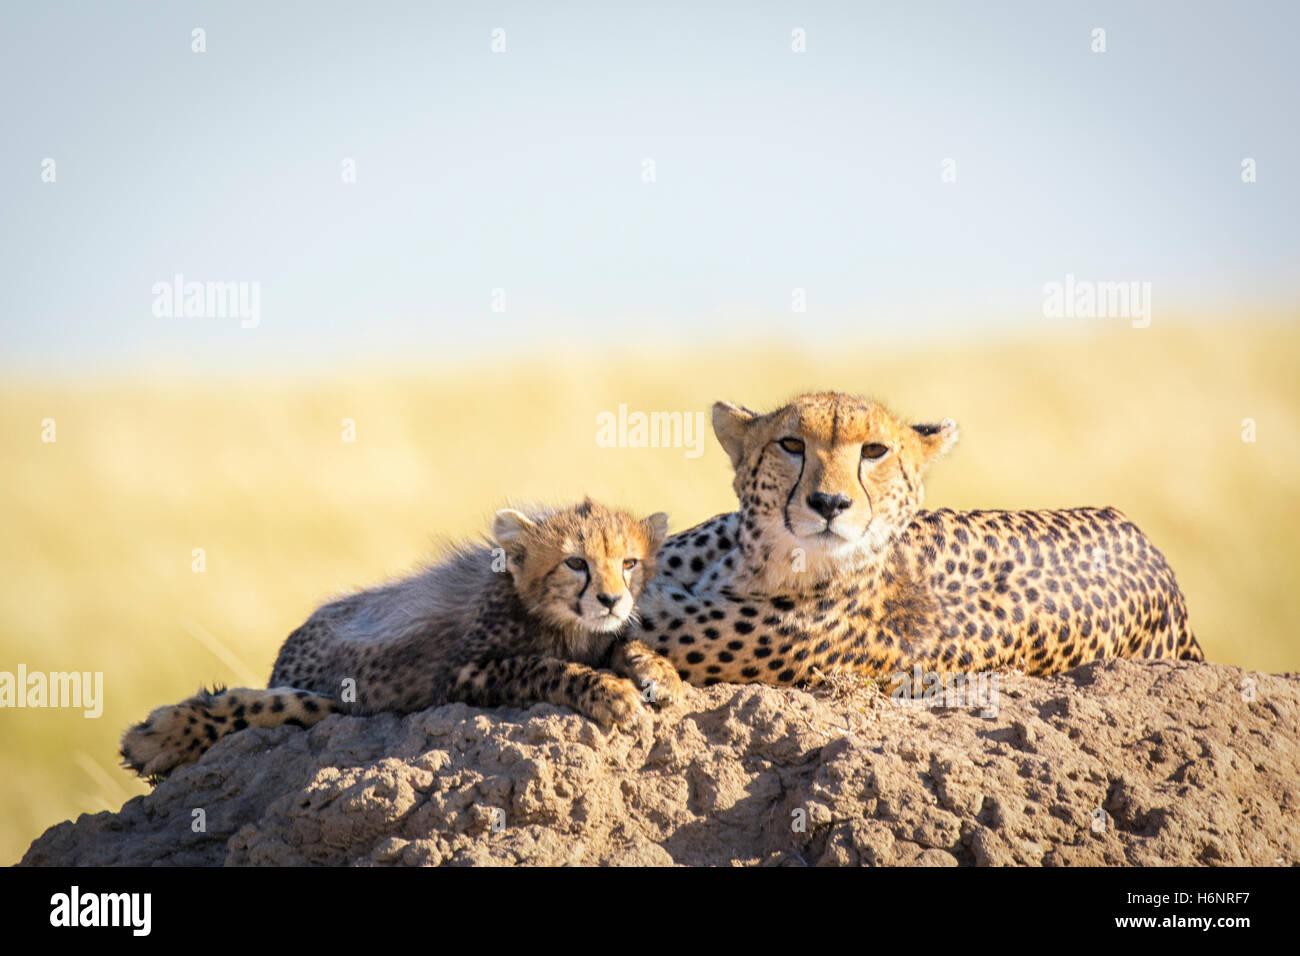 Wild Cheetah madre con lindo pequeño Cub, Acinonyx jubatus, Reserva Nacional de Masai Mara, Kenia, África Oriental Foto de stock